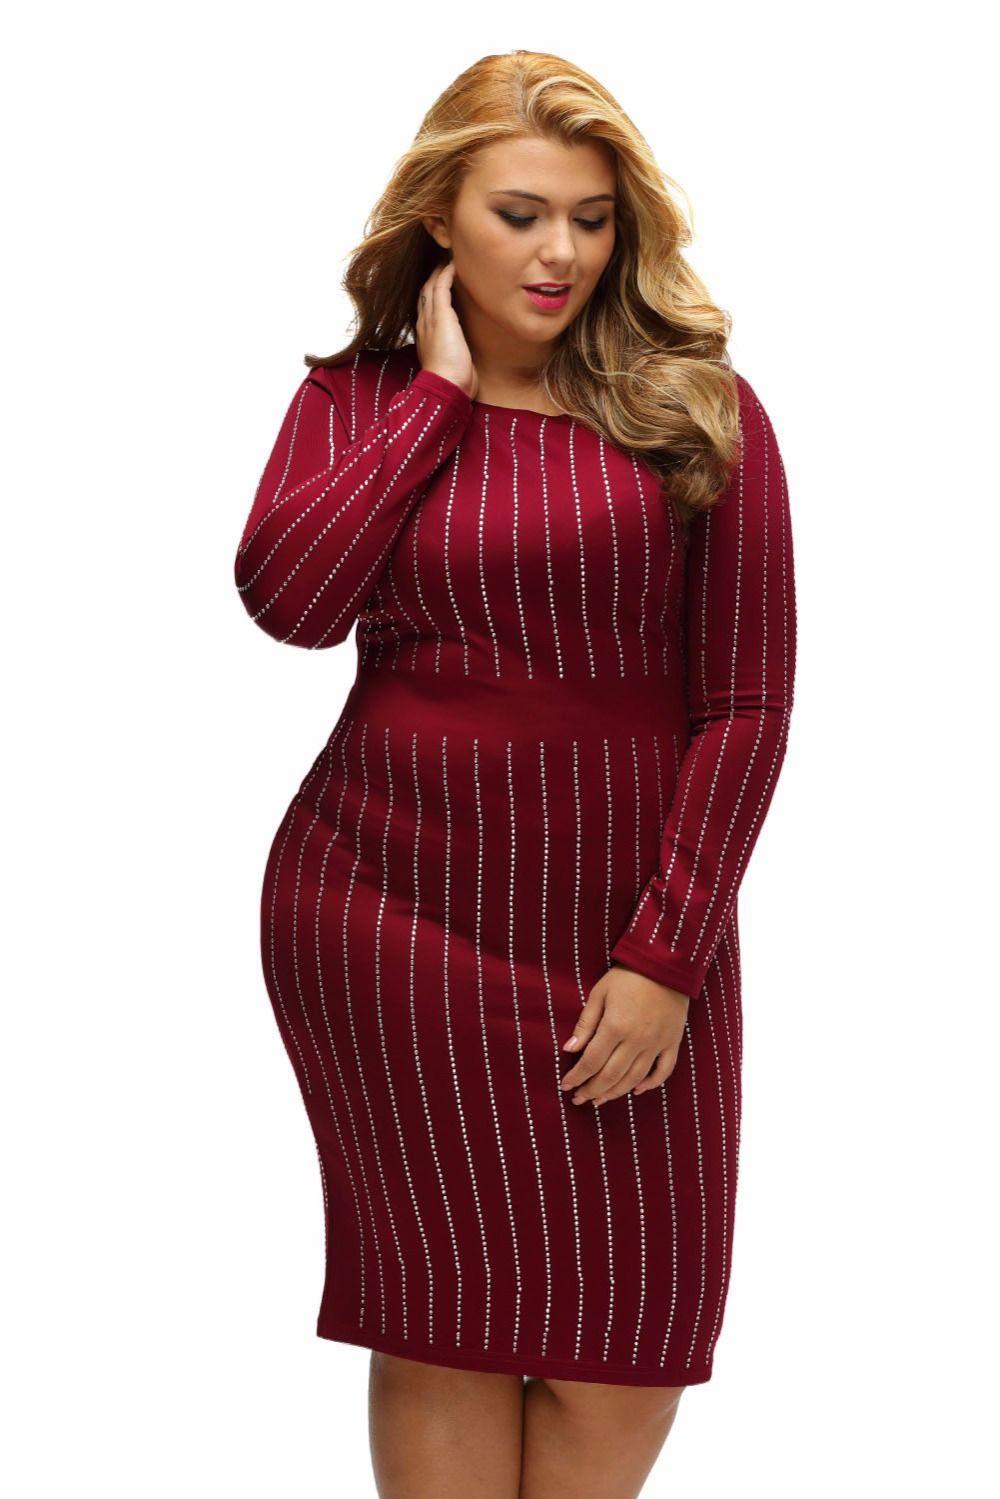 autumn new fashion ol style women plus size dresses big girls